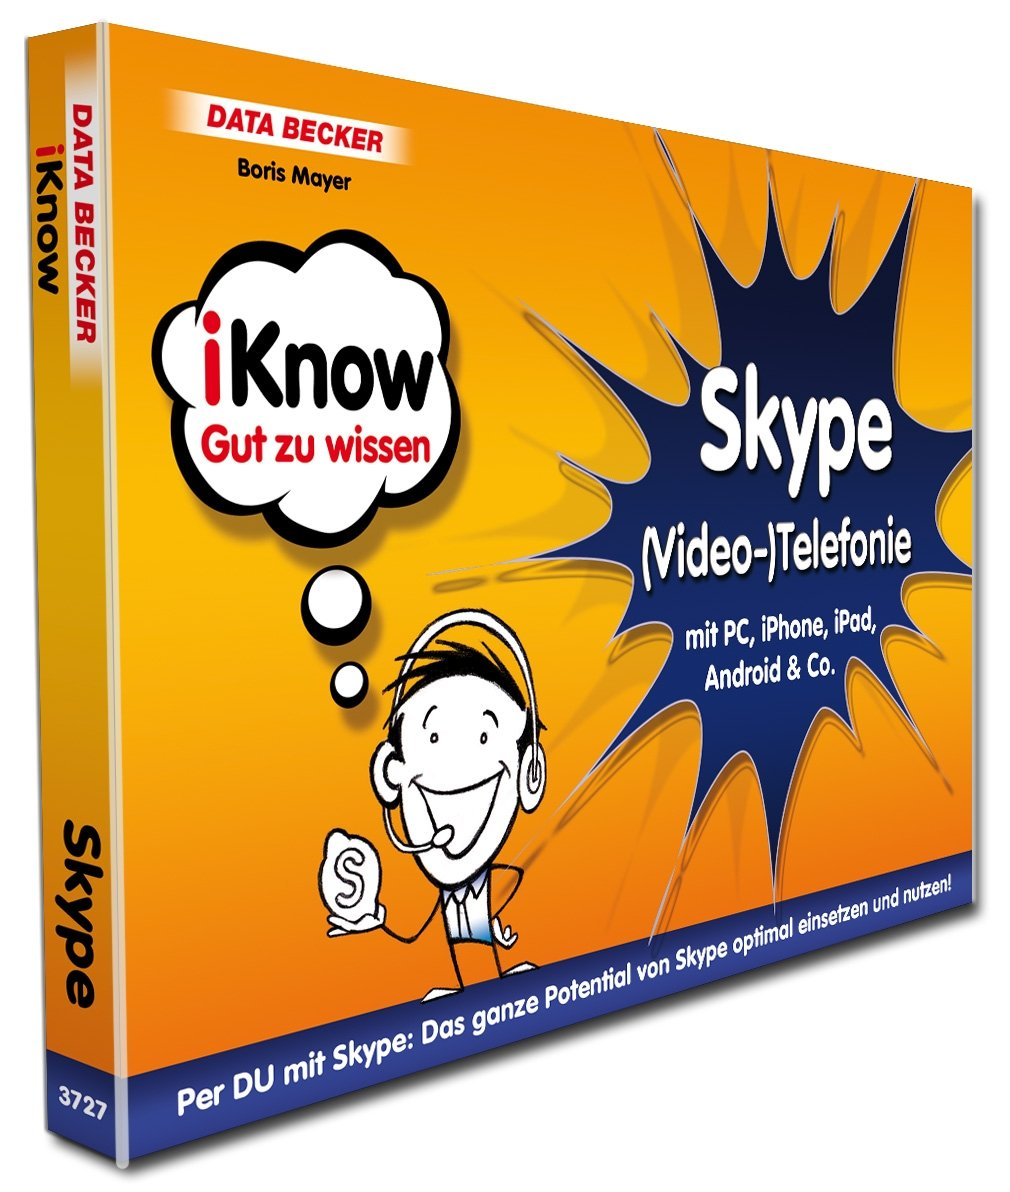 iKnow Skype